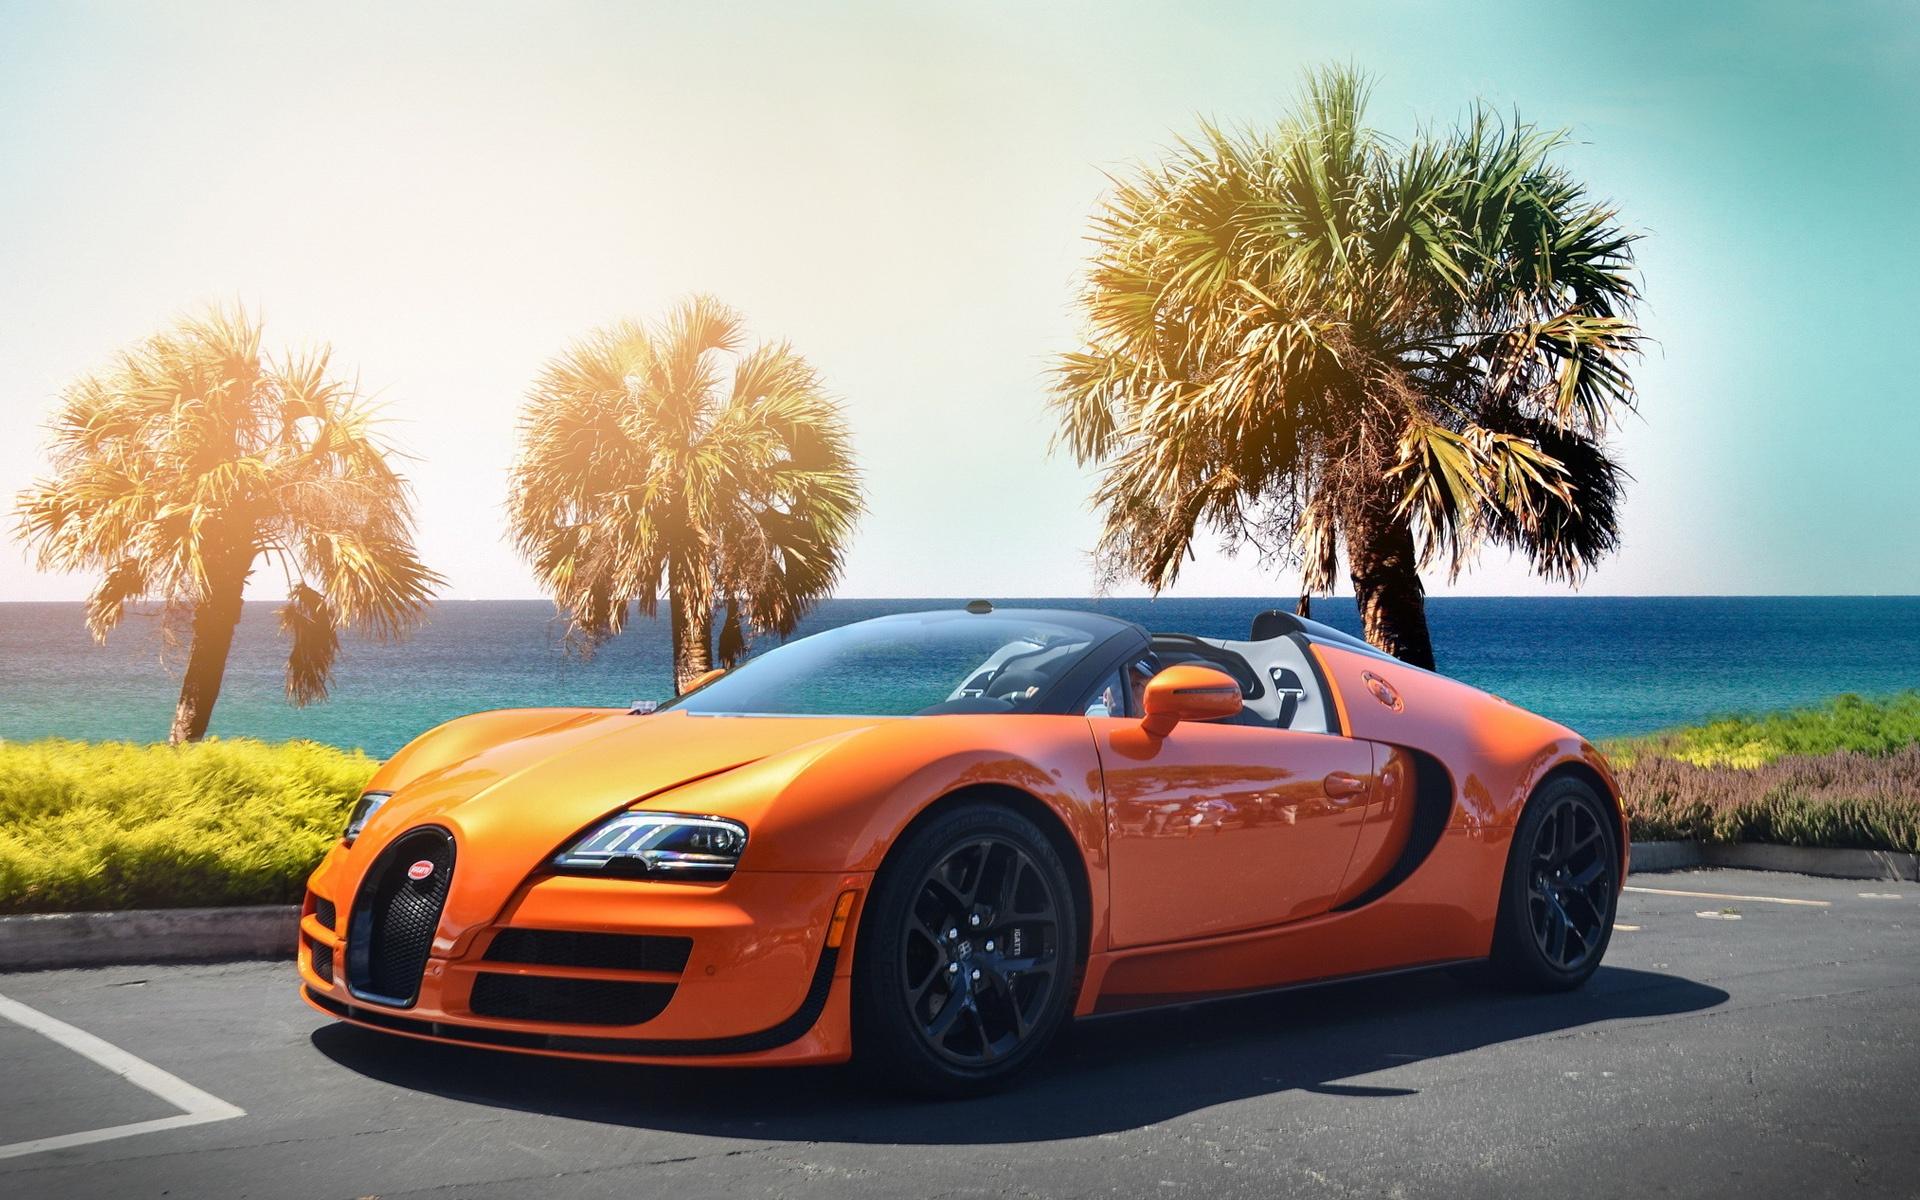 Bugatti Veyron Hypercar Orange Color Wallpapers Wide